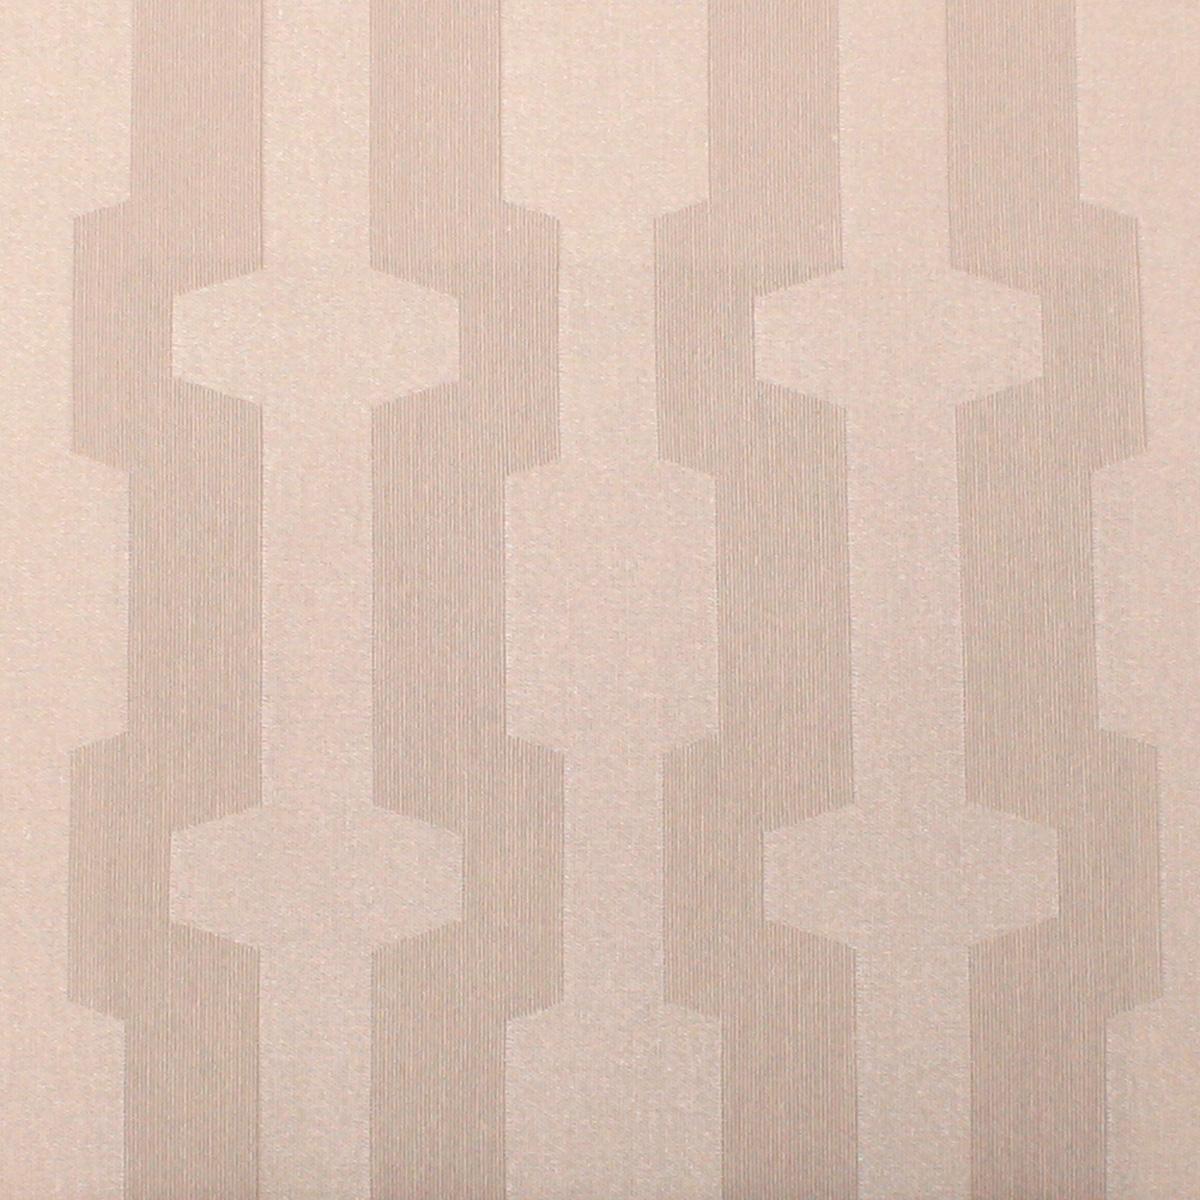 dekorationsstoffe gardinen nach ma stoffrollos. Black Bedroom Furniture Sets. Home Design Ideas